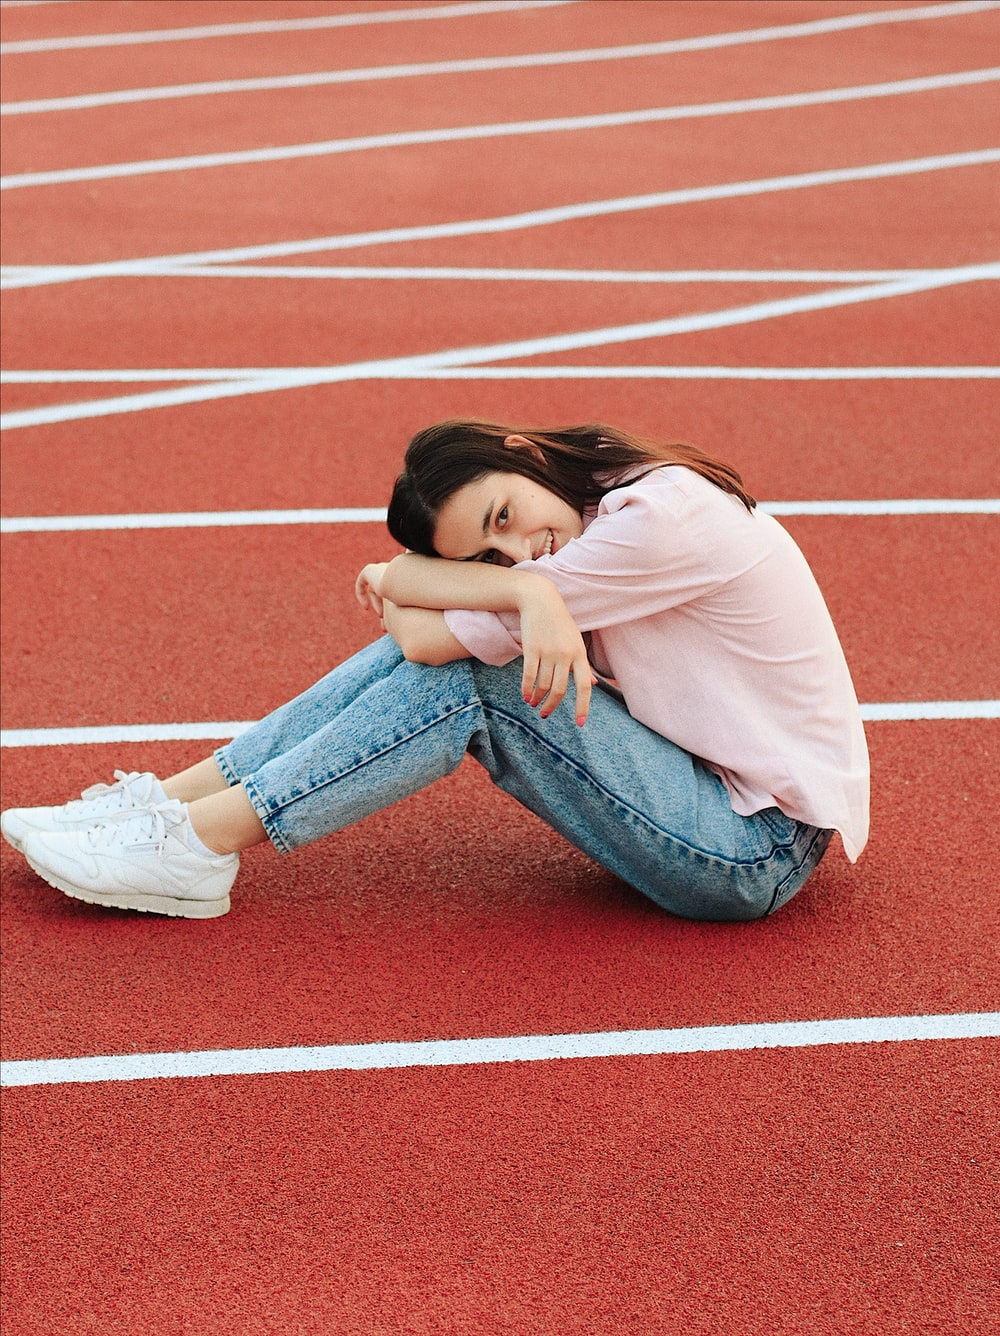 woman sitting on track field